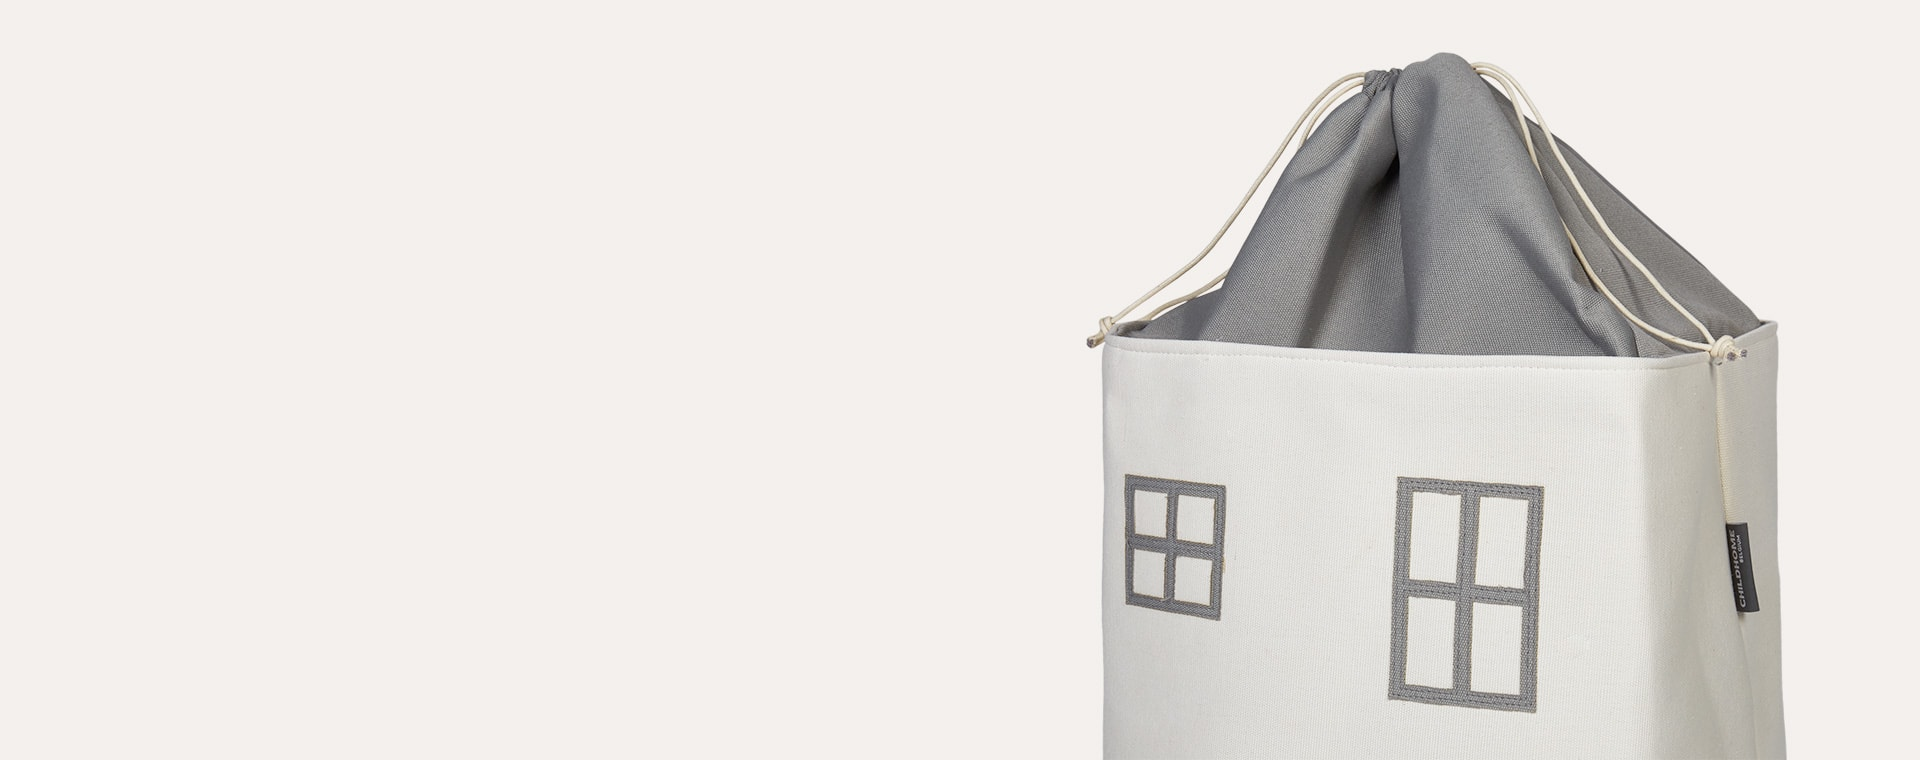 Grey Childhome Toy Box House Bag